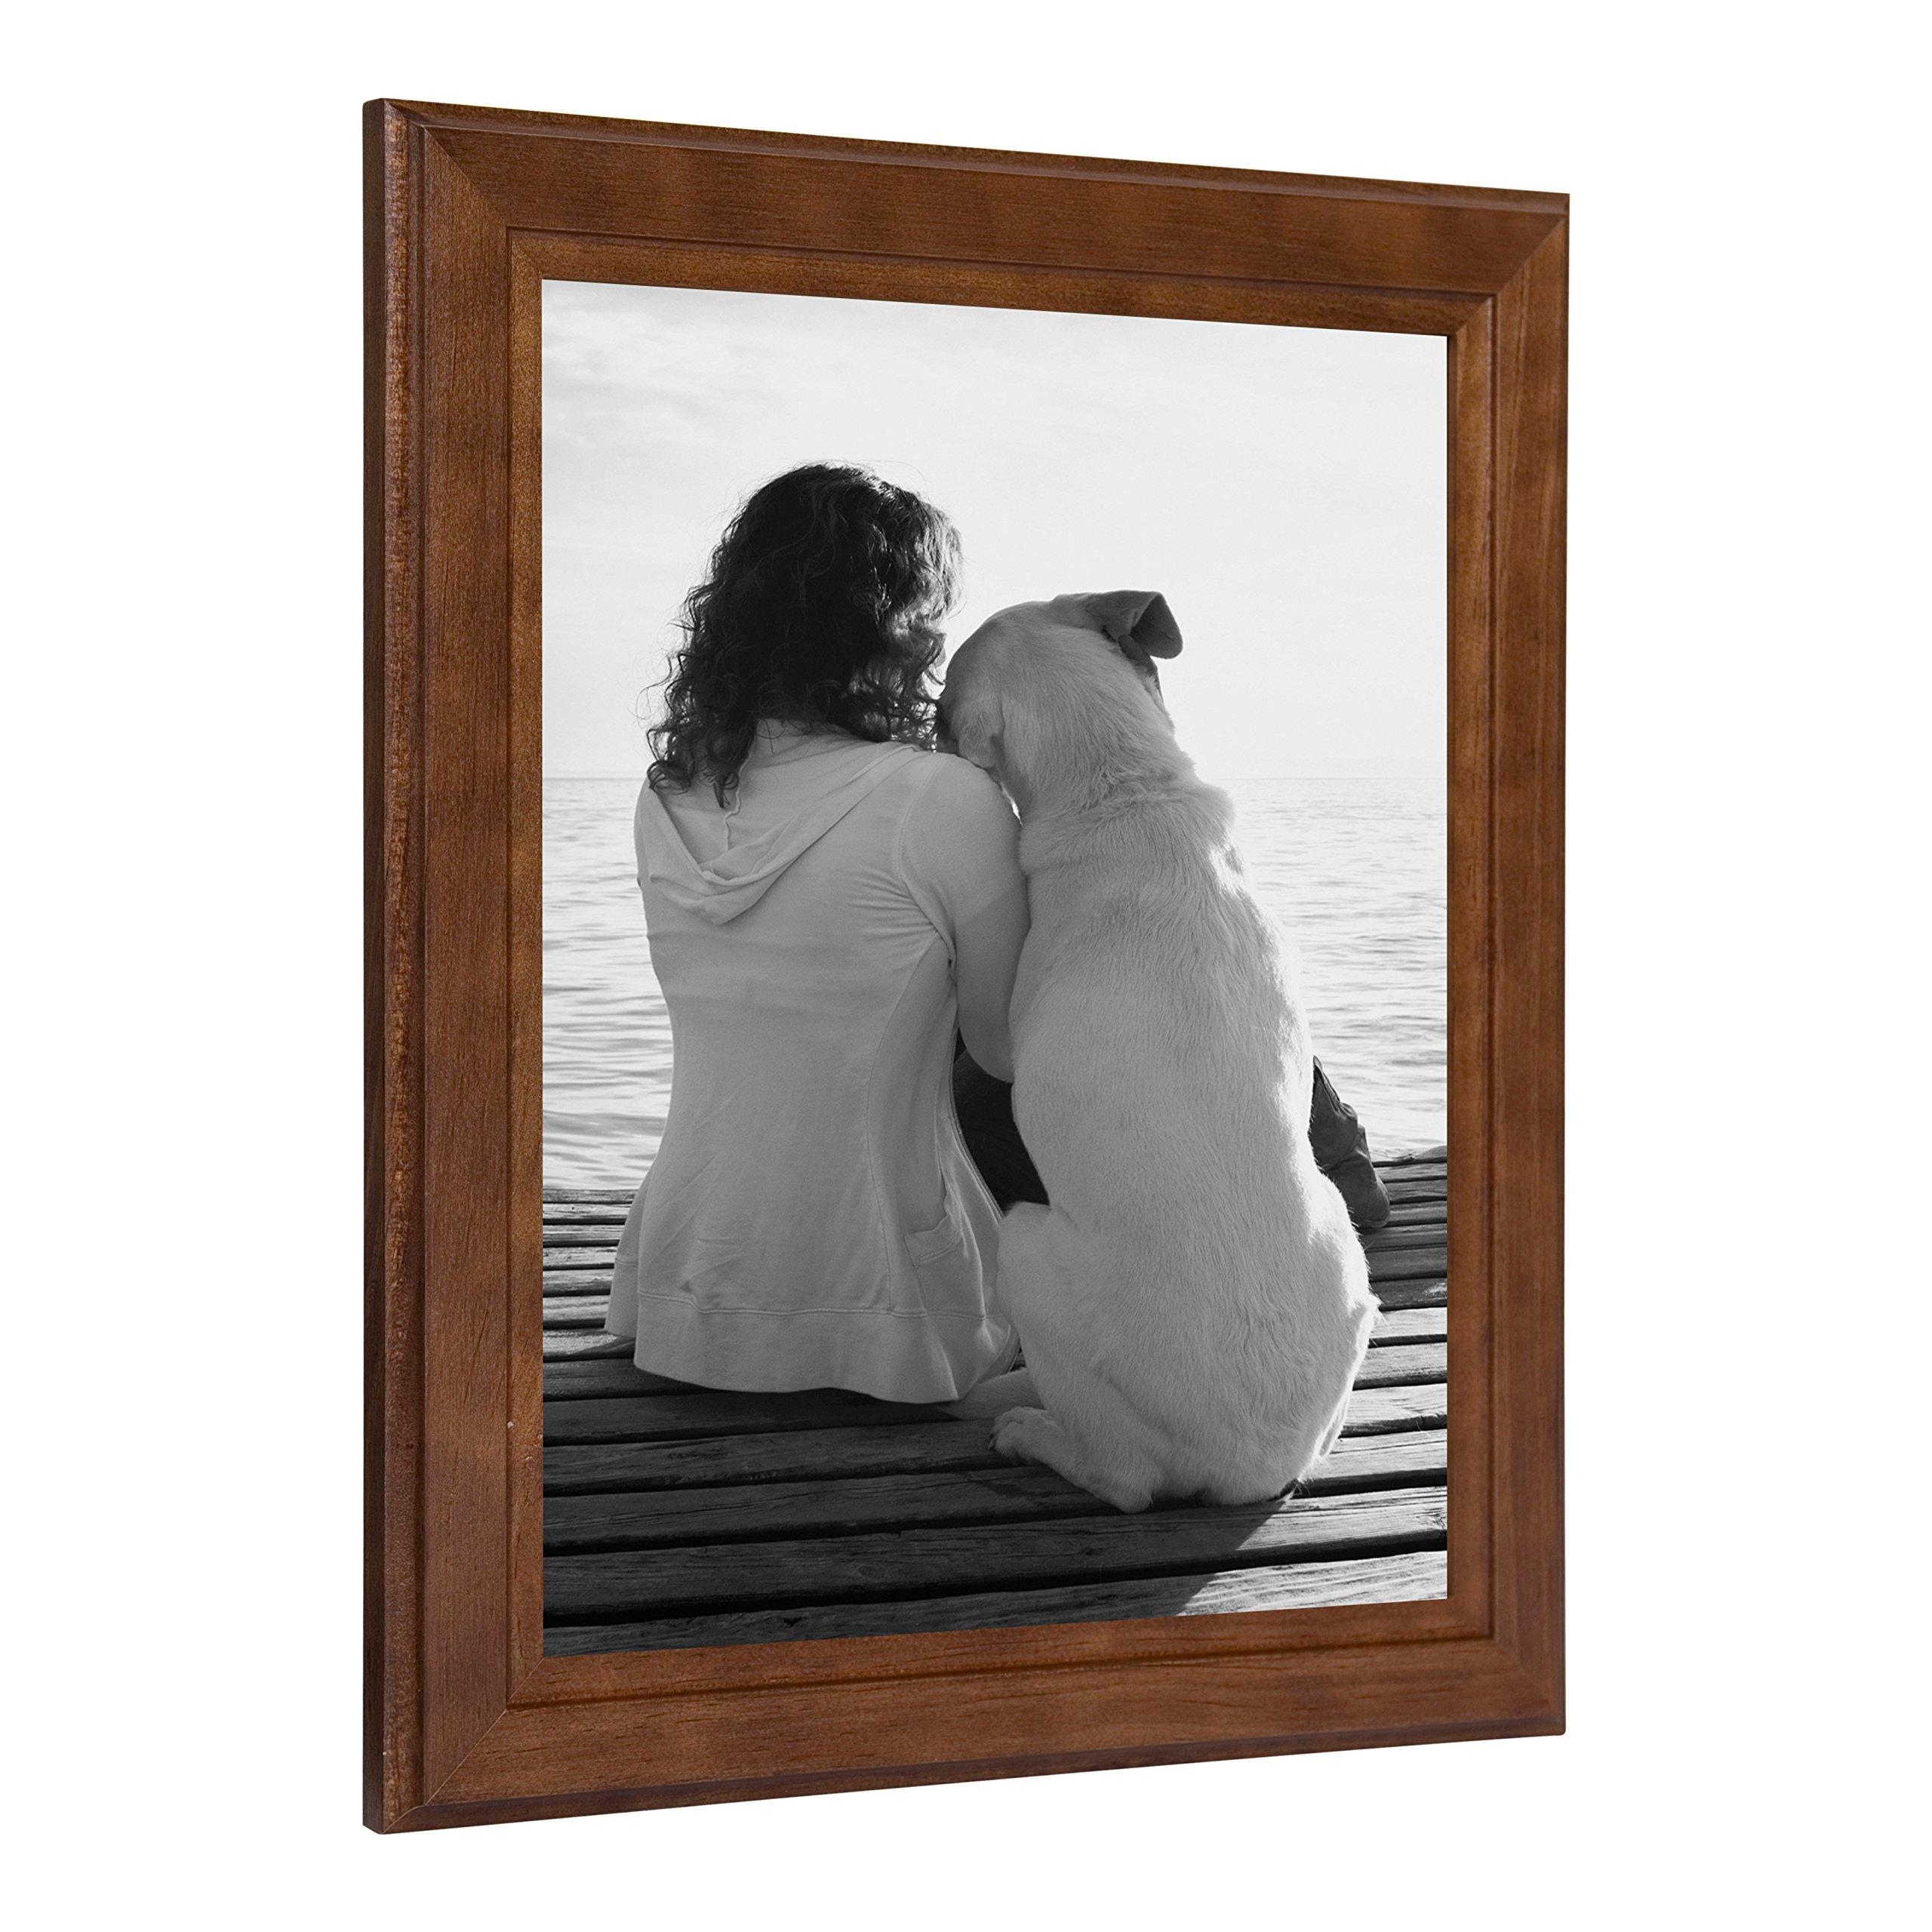 DesignOvation Kieva Solid Wood Picture Frames, Espresso Brown 8x10, Pack of 6 by DesignOvation (Image #3)